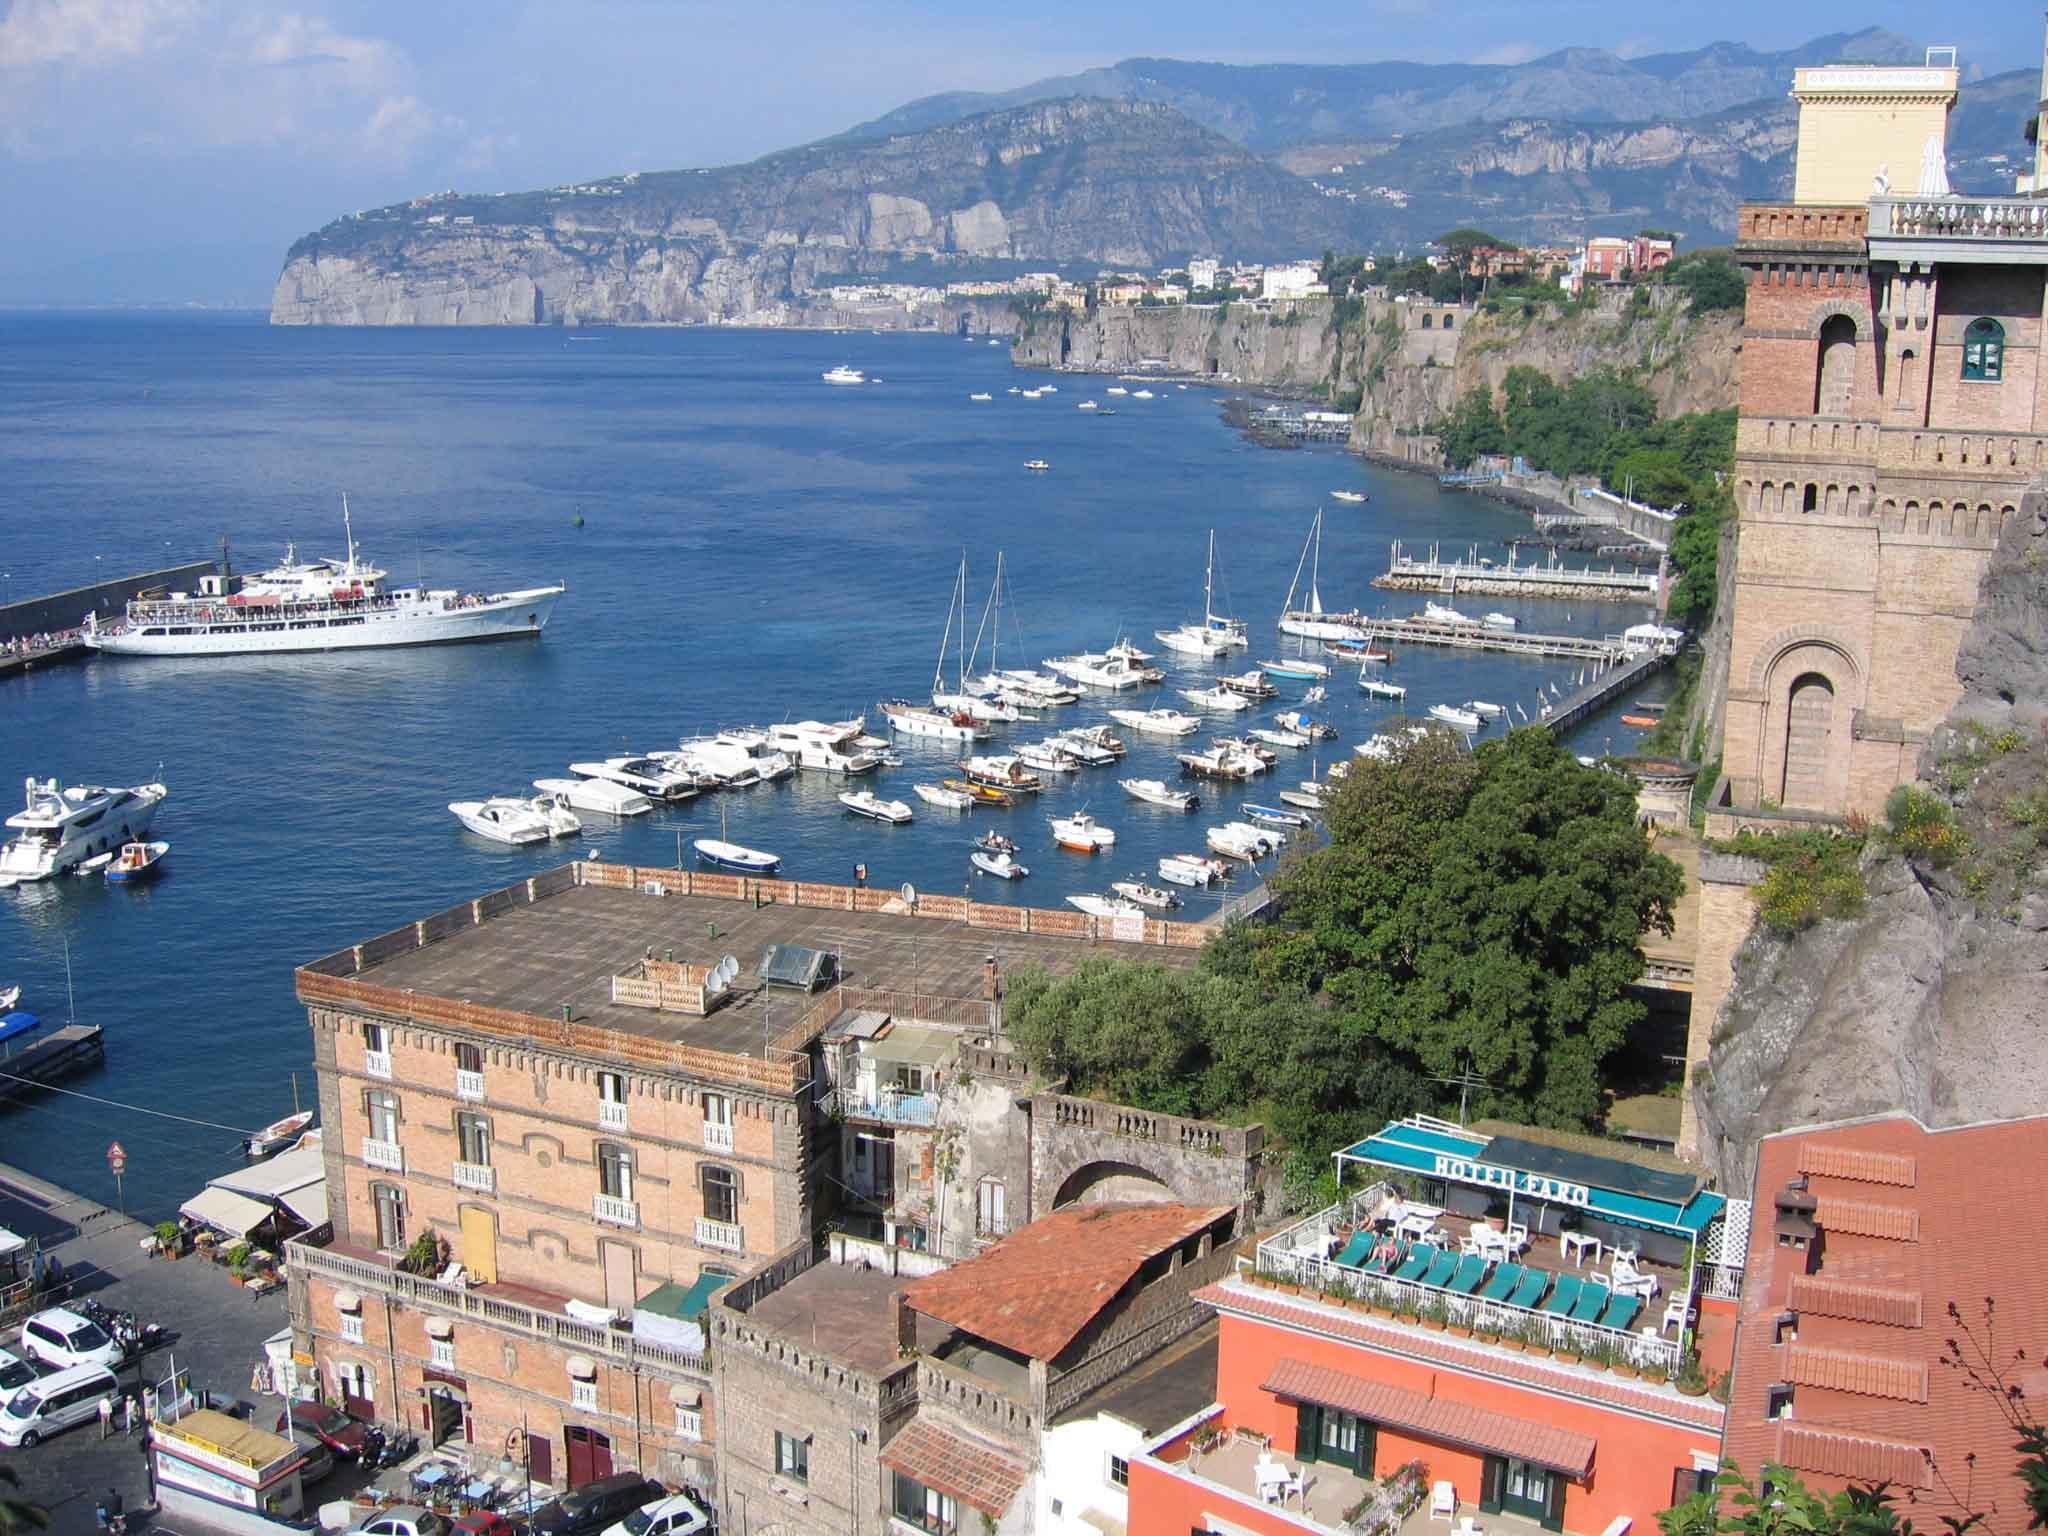 Vacanze Costiera Amalfitana - Sorrento Penisola Sorrento